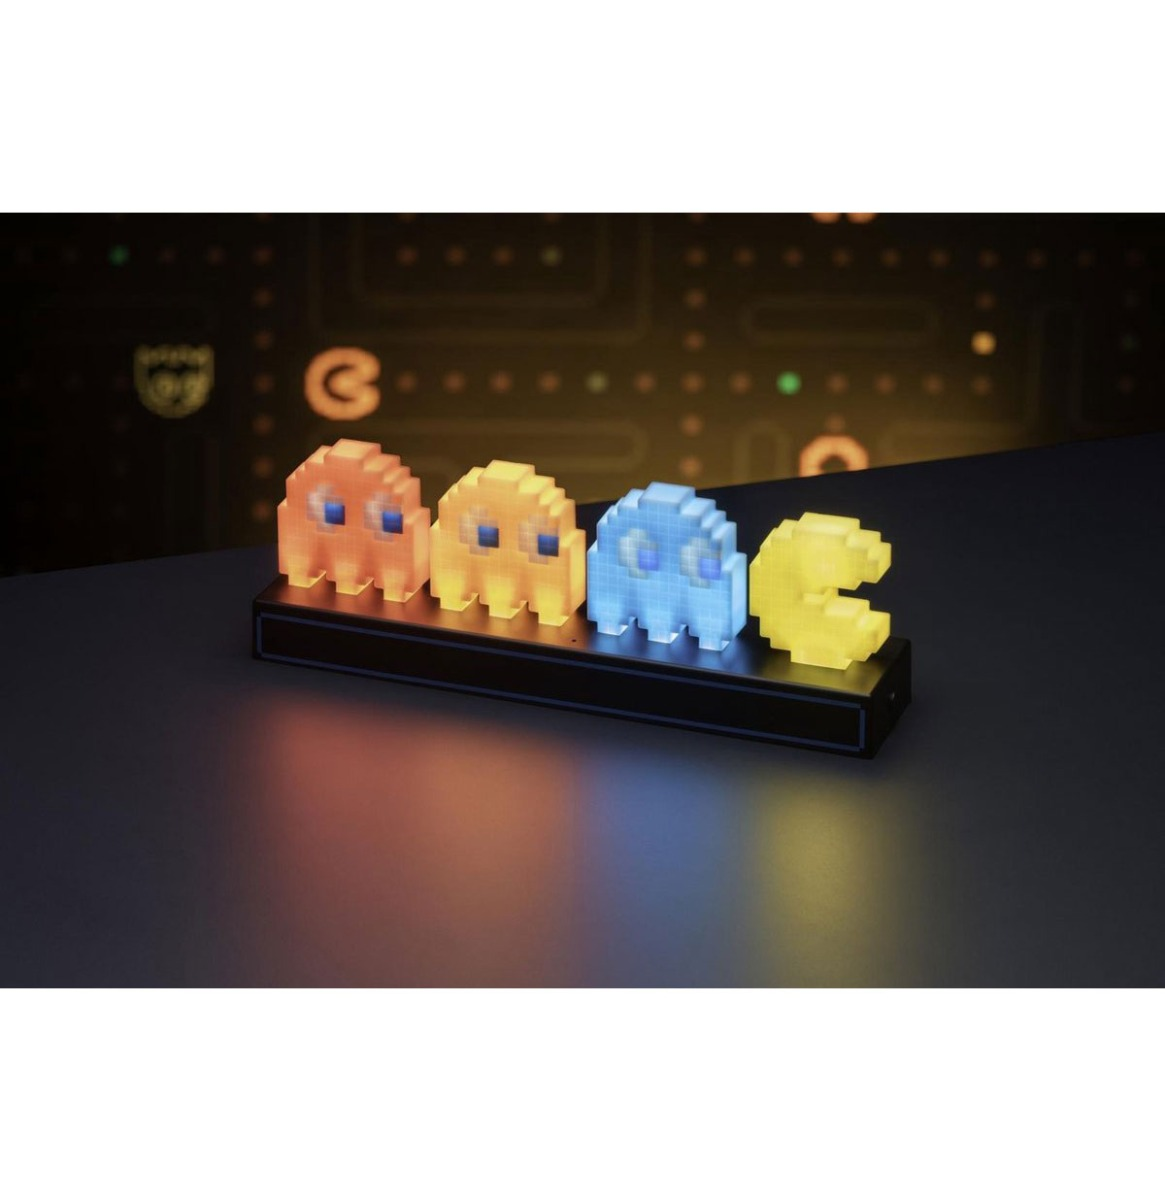 Pac-Man: Pac-Man and Ghosts Licht